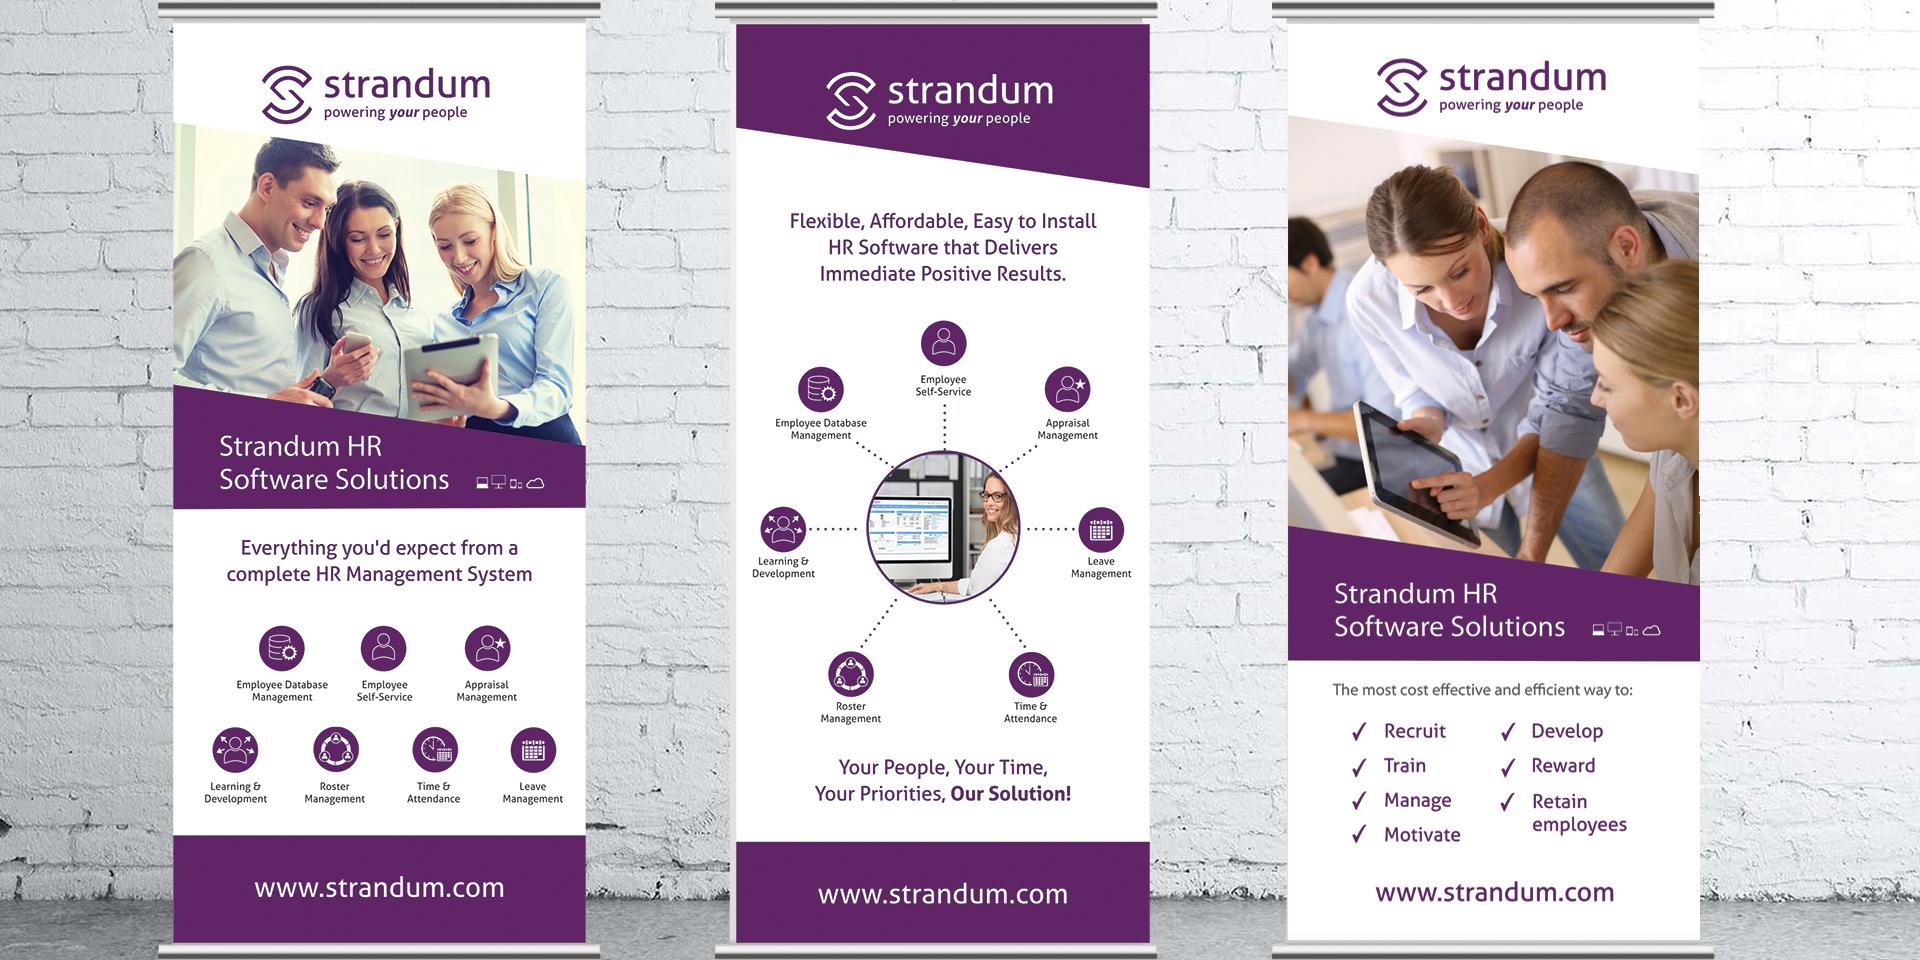 Strandum Pop Up Design & Print